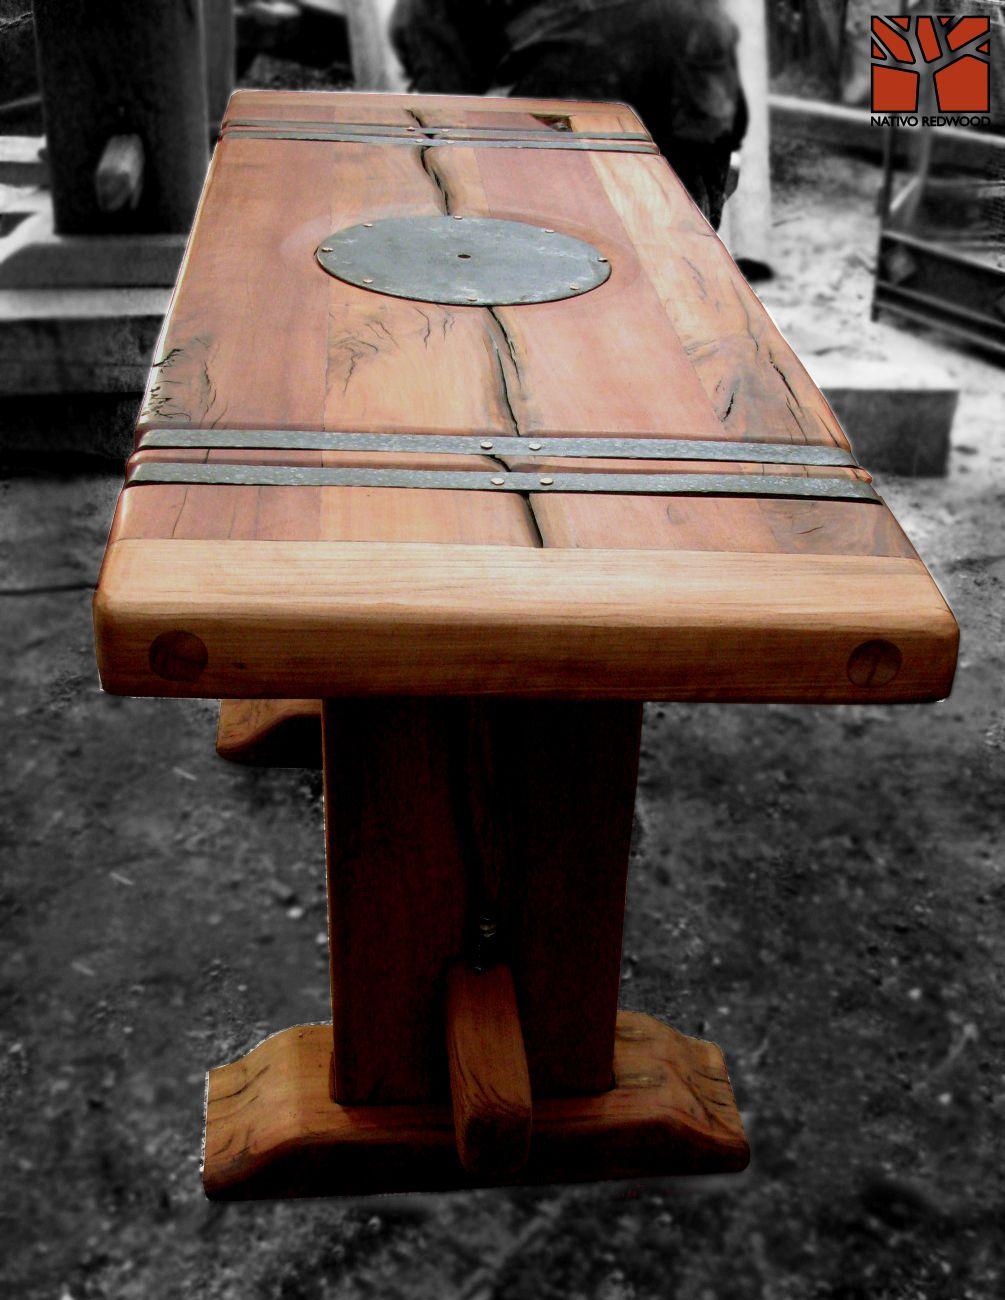 nativo redwood arrimo de madera roble r stico con aplicaciones de fierro forjado con plato. Black Bedroom Furniture Sets. Home Design Ideas